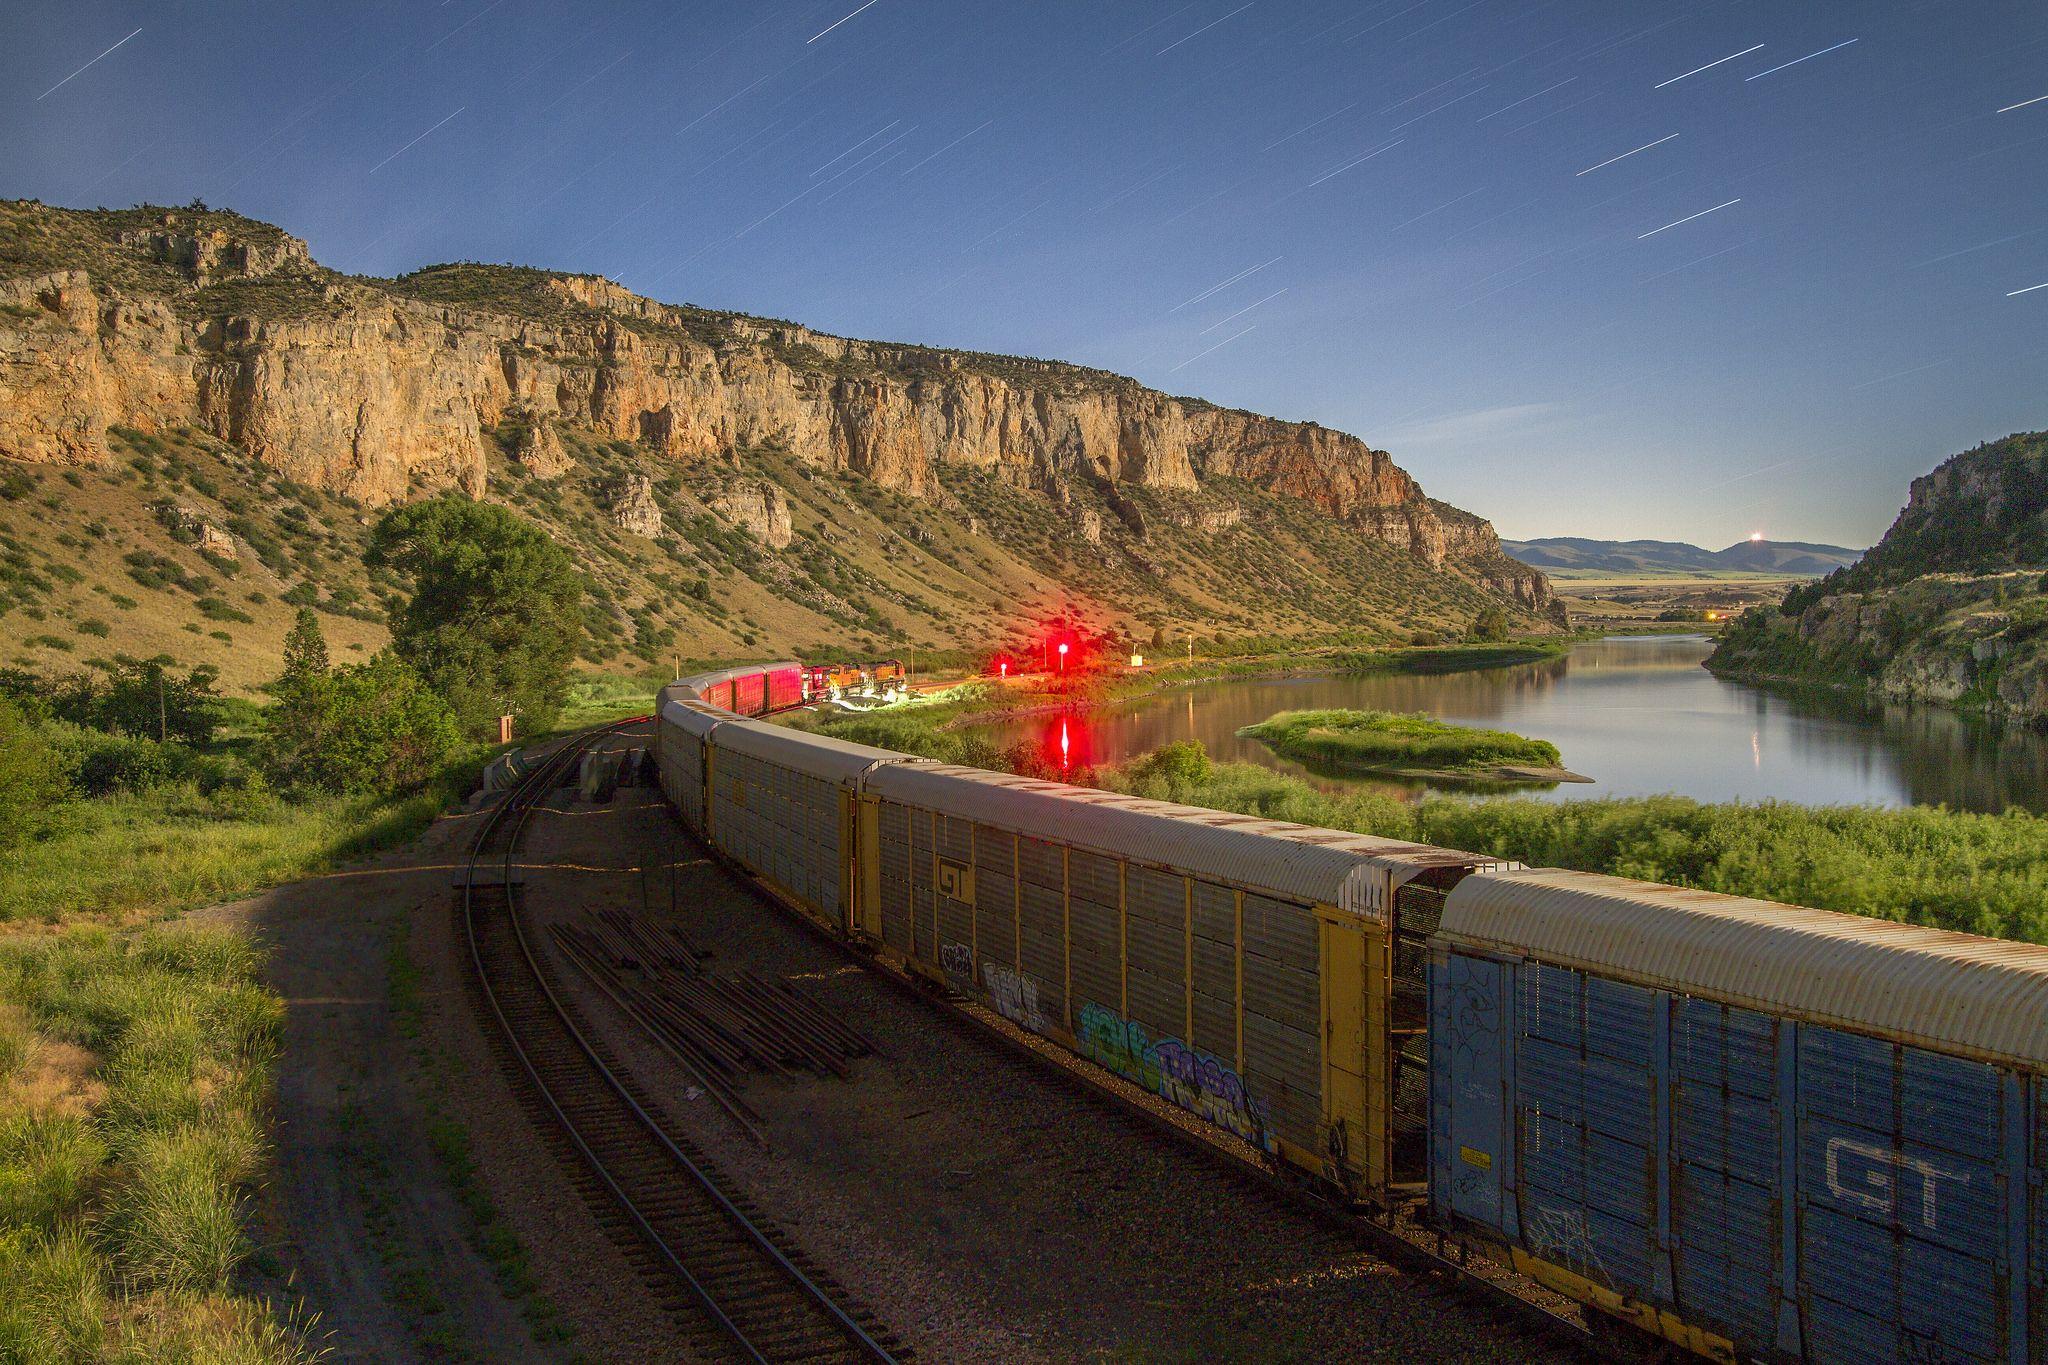 https://flic.kr/p/uHAp9S | Hold the Main | A BNSF Railway V-AUBKCK train (Vehicles-Auburn, Washington-Kansas City, Kansas) waits on Montana Rail Link's 2nd Subdivision main during a gorgeous moonlit evening in Lombard Canyon. Lombard, Montana.